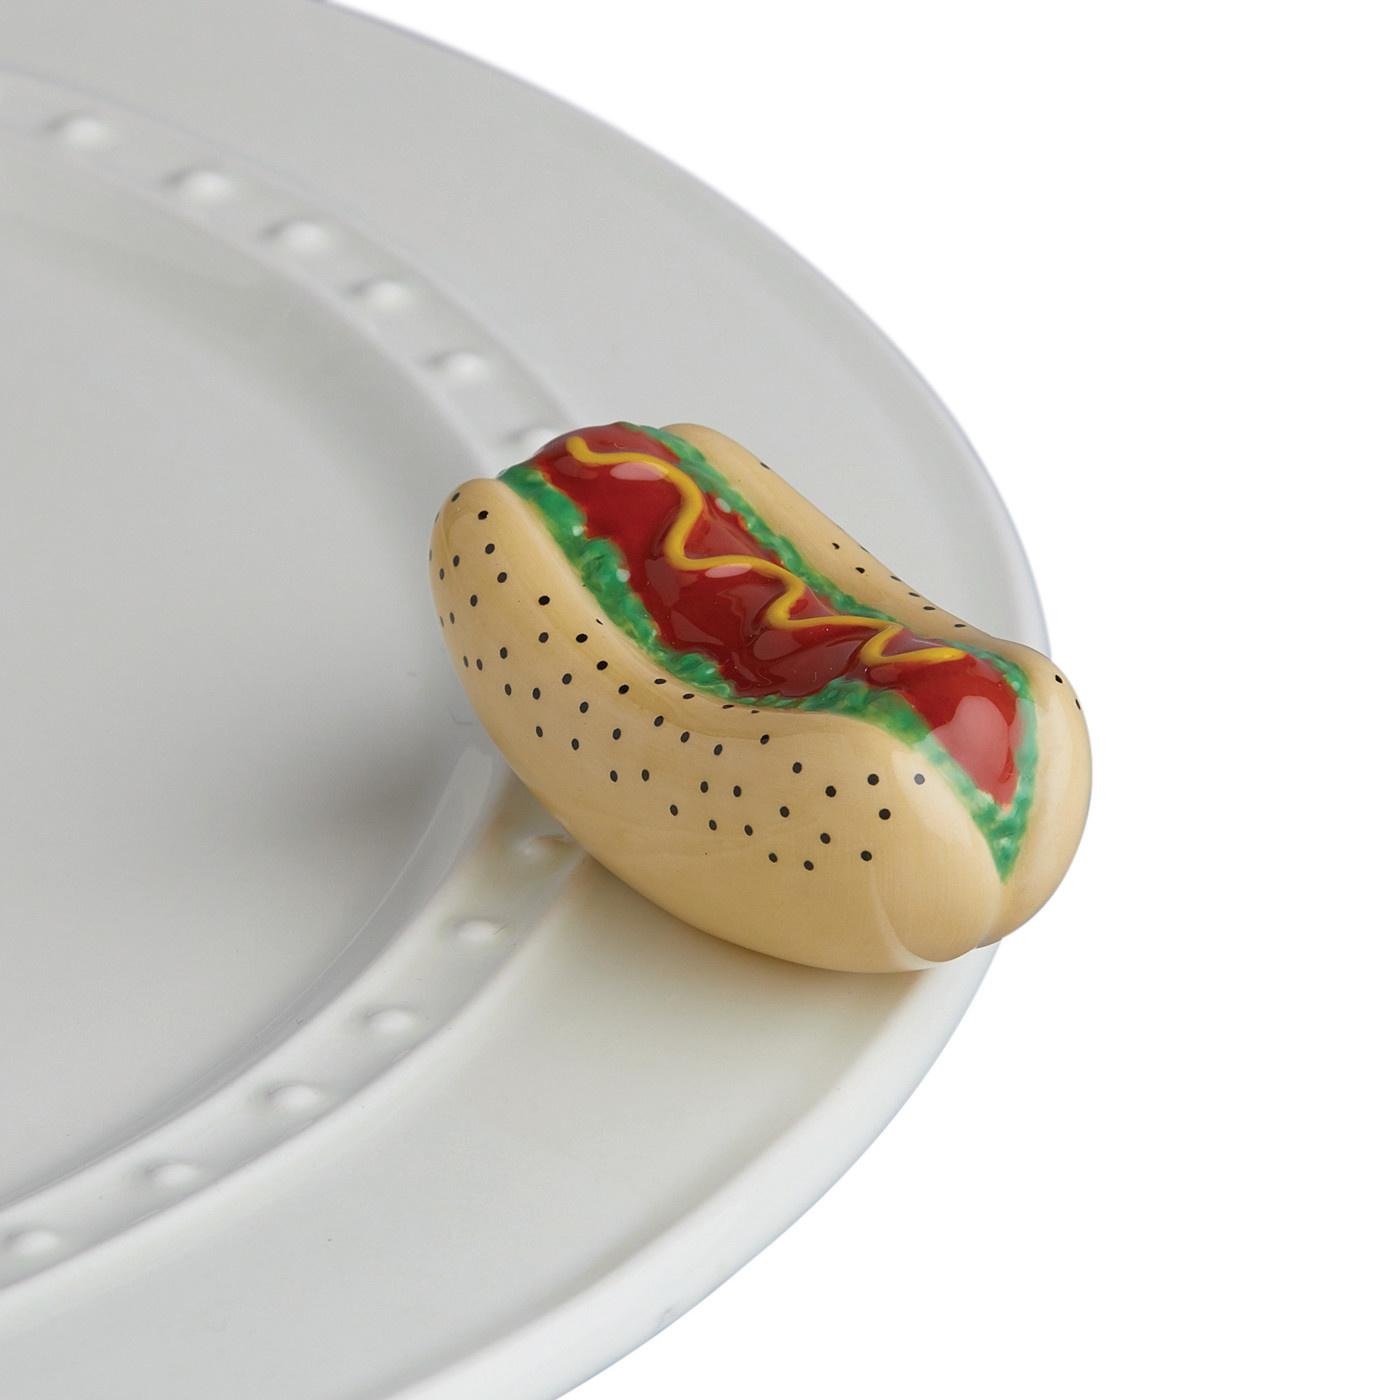 nora fleming chicago dog mini (hotdog)